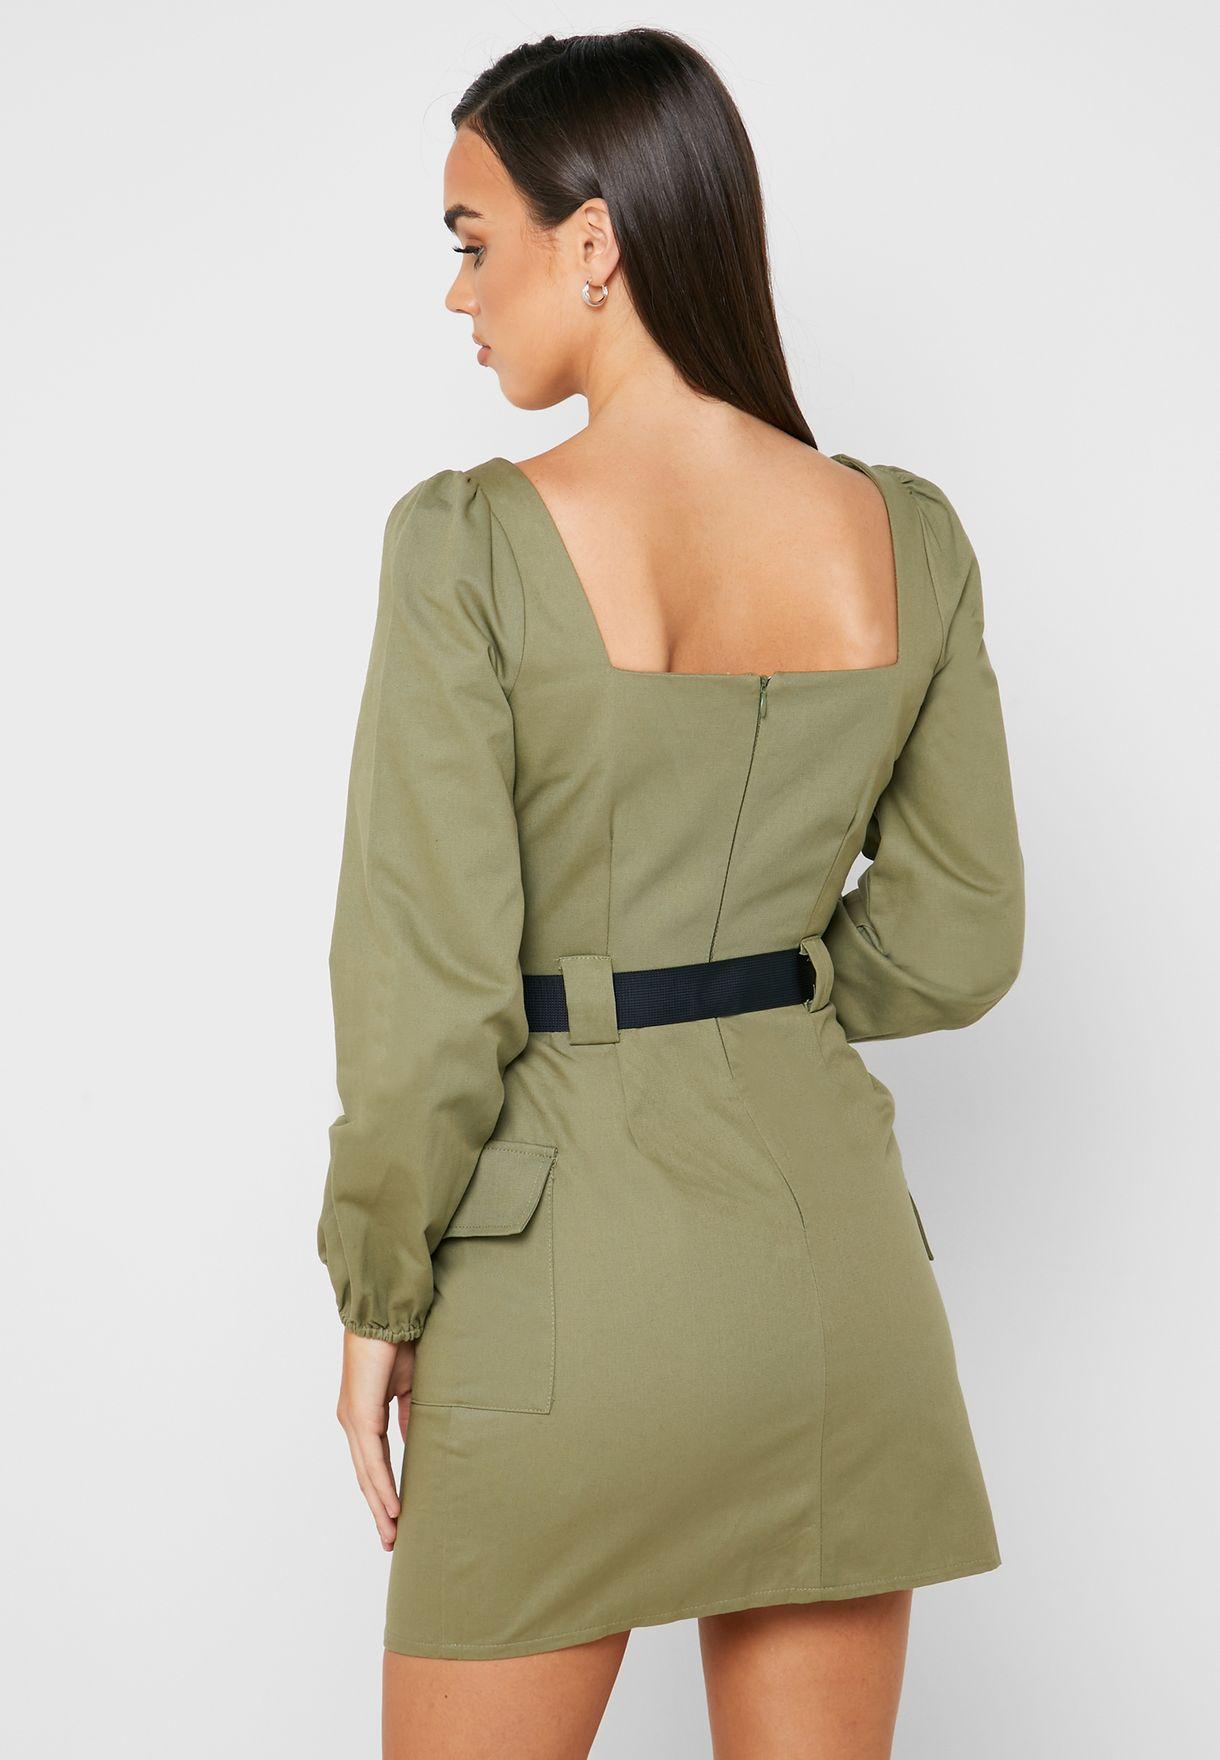 Square Neck Belted Dress